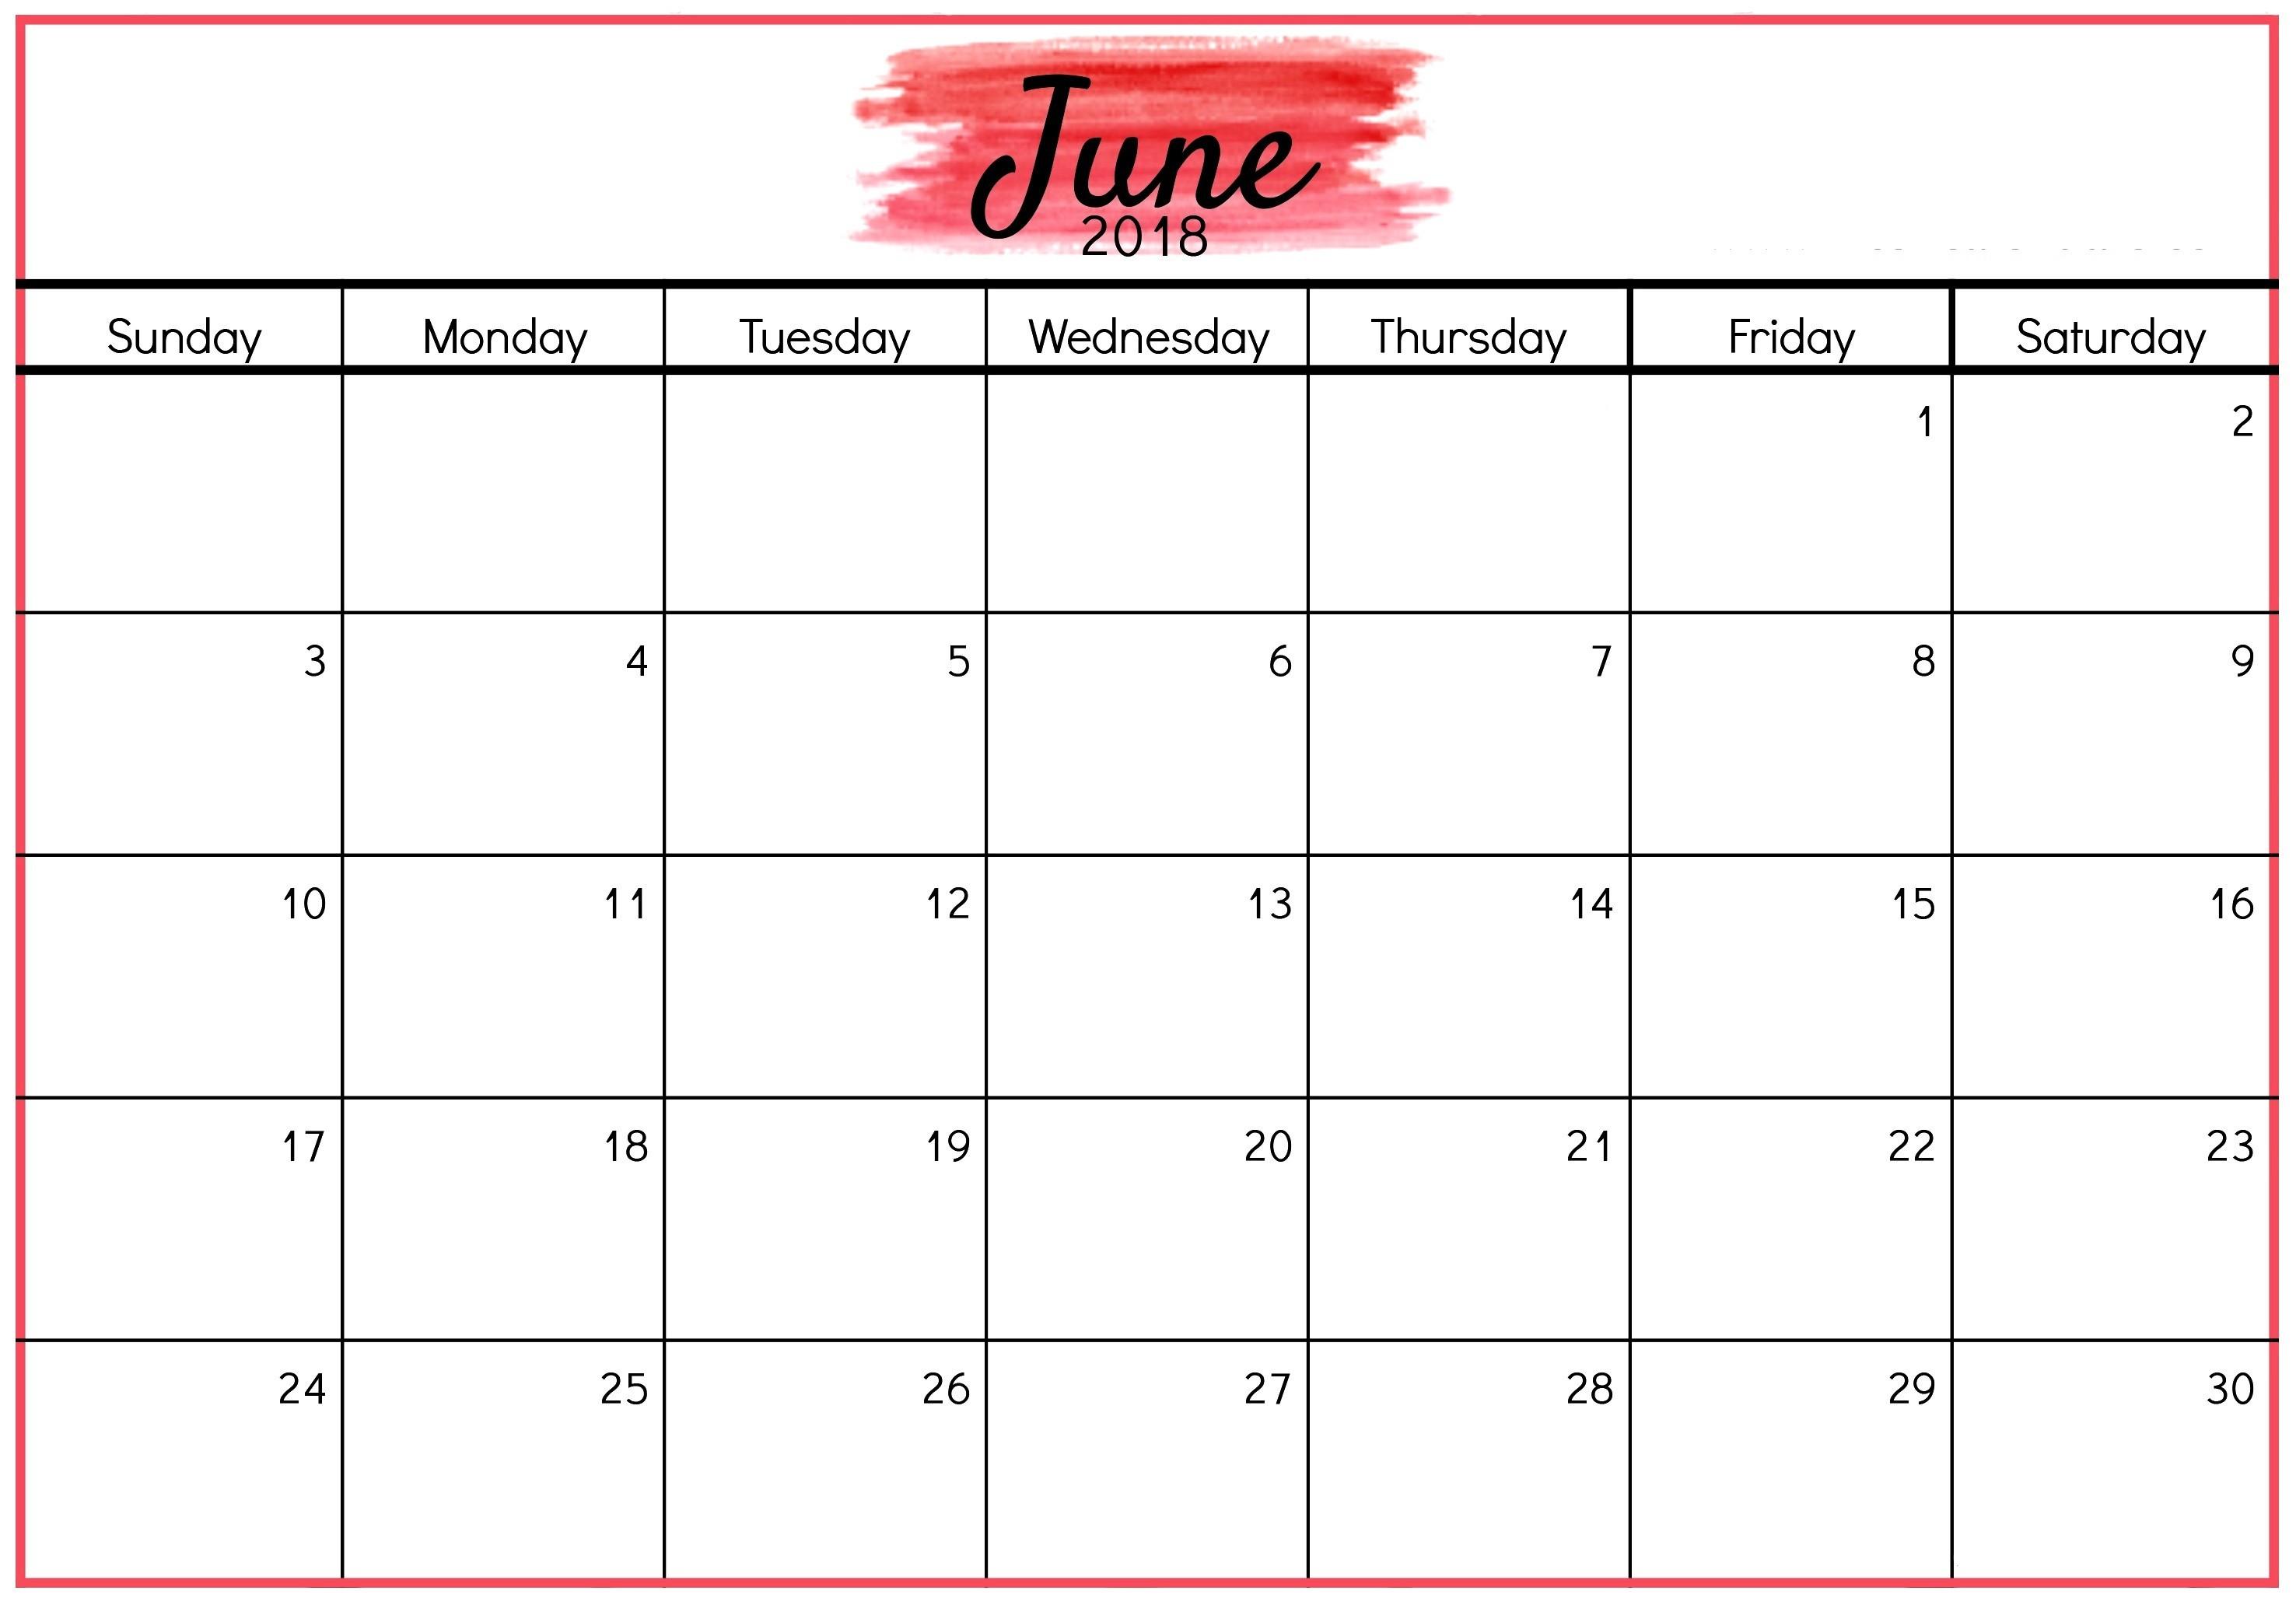 Calendar 2019 Free Download Más Recientemente Liberado Calendar Preview Holidays Announcement — Abwnet Of Calendar 2019 Free Download Más Arriba-a-fecha Beautiful 25 Examples Print A Calendar 2019